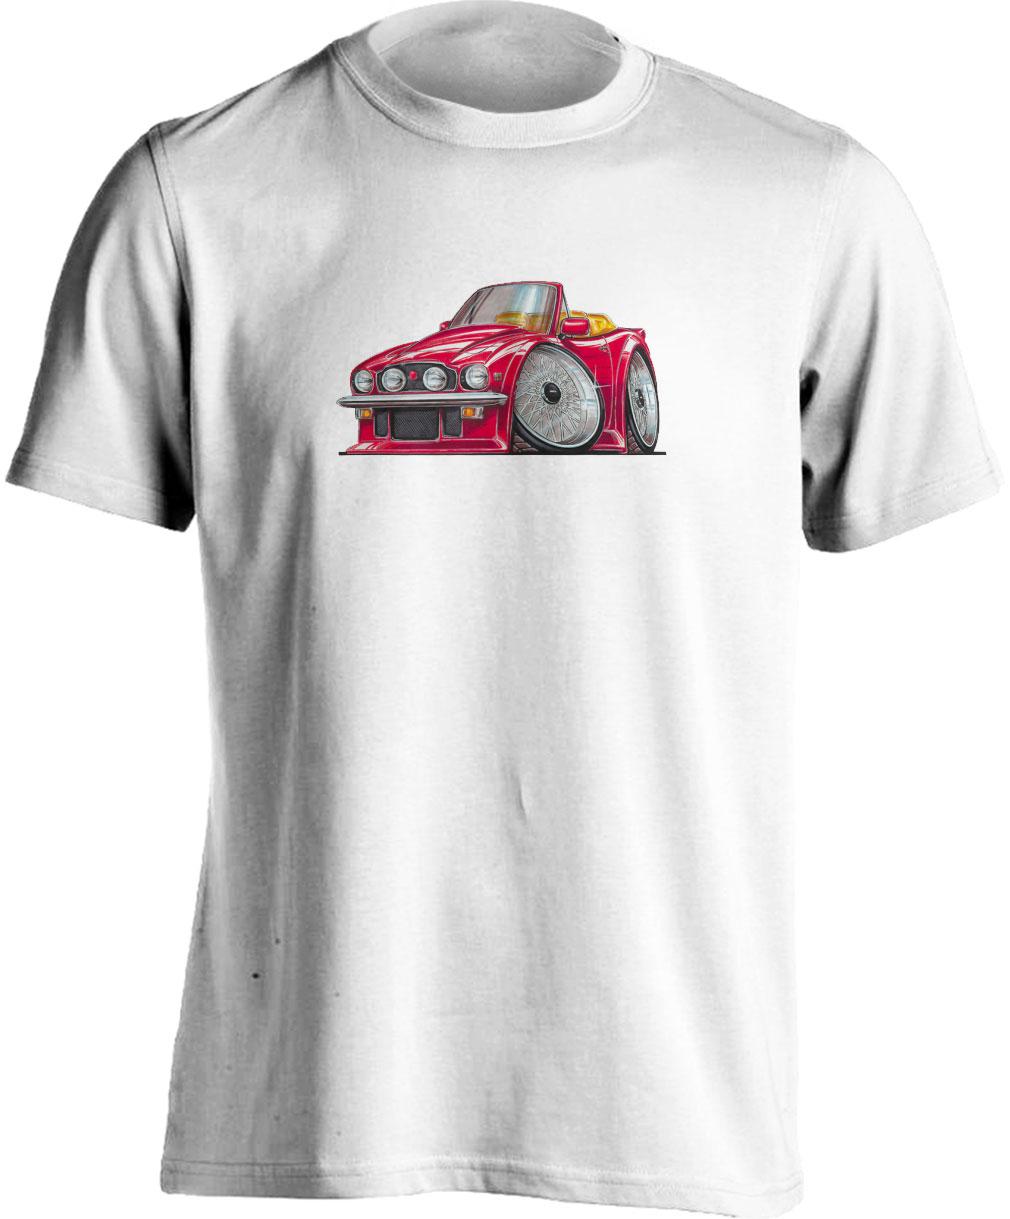 Koolart Aston Martin DB6 Cabrio Red-0526 Child's T Shirt